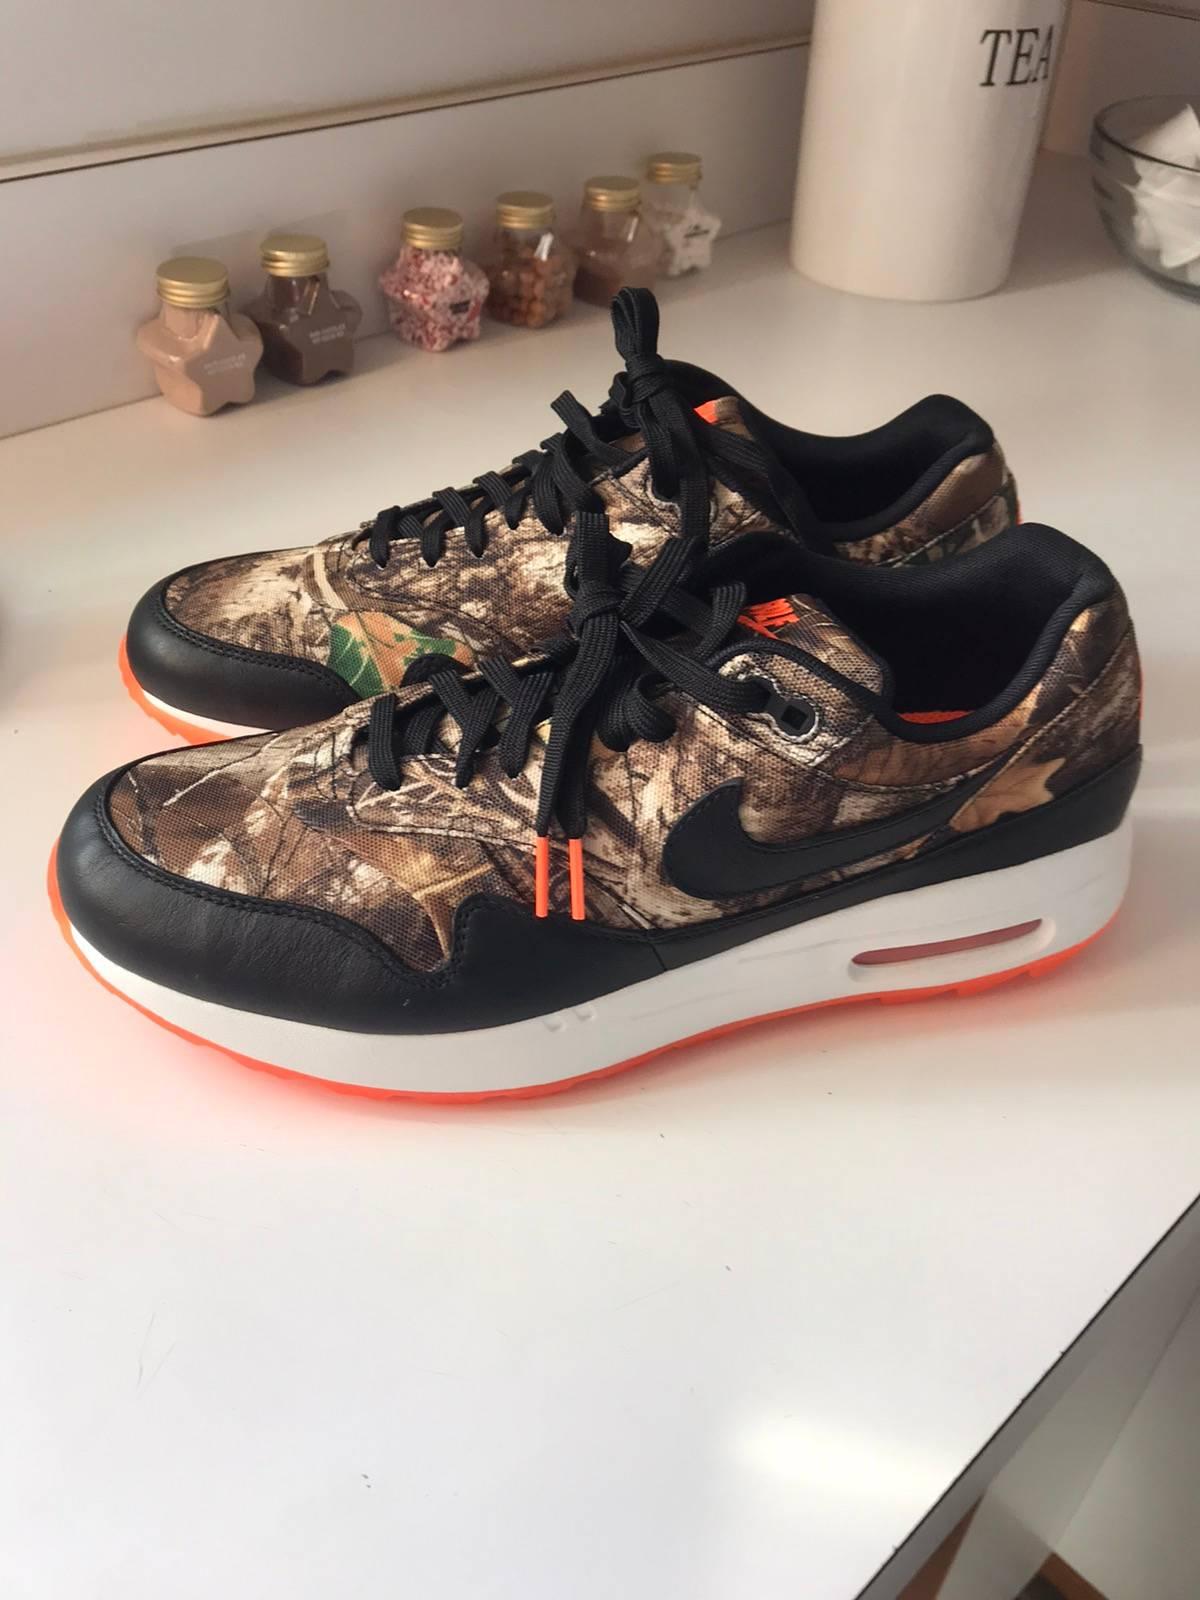 repertorio Recuerdo Progreso  Nike Nike Air Max 1 Golf 'realtree Camo' Sz. 10.5- Deadstock   Grailed